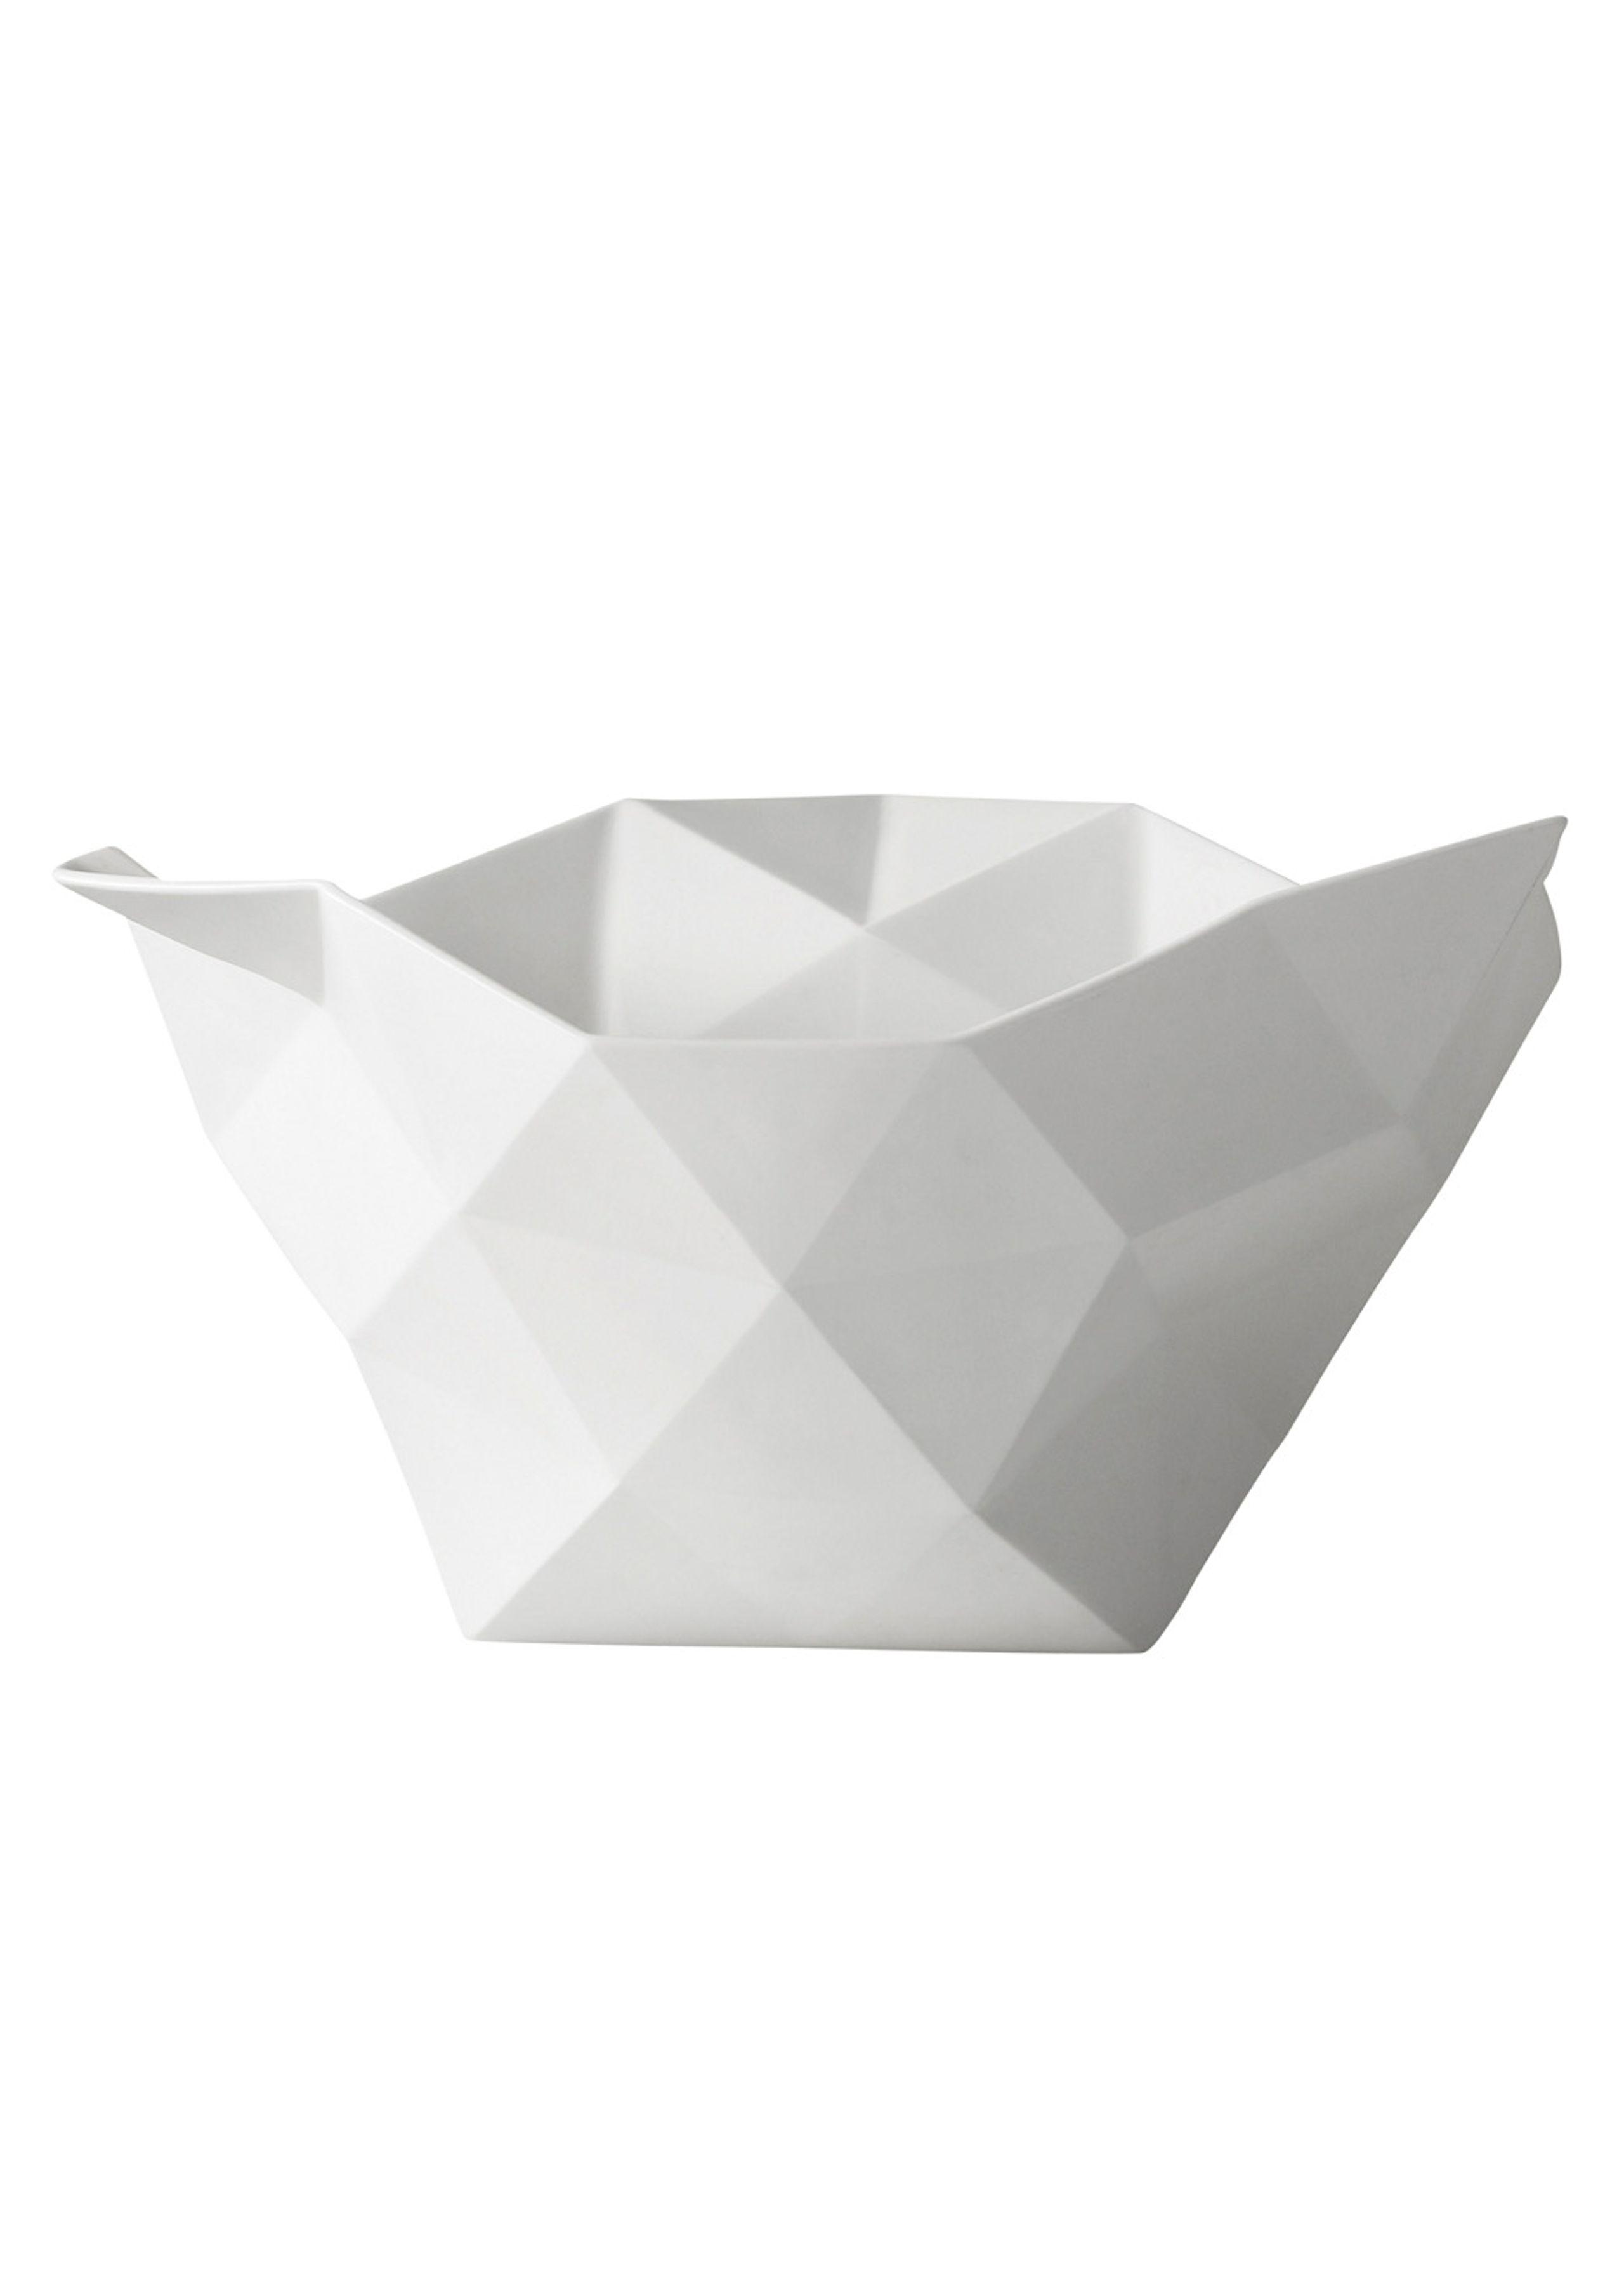 Image of   Crushed Bowl